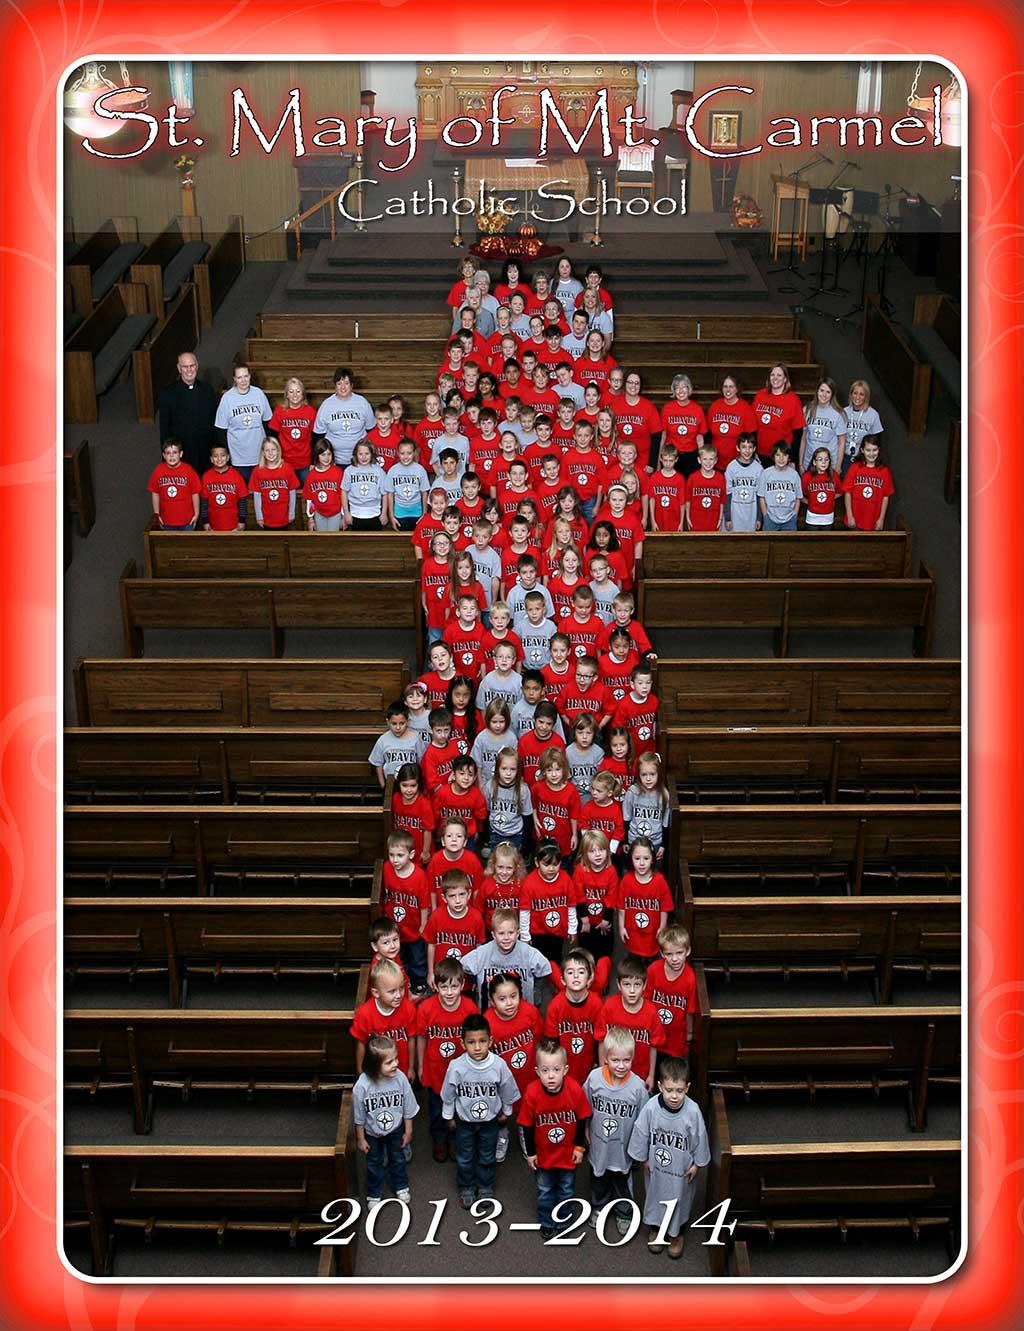 School Picture 2013-2014